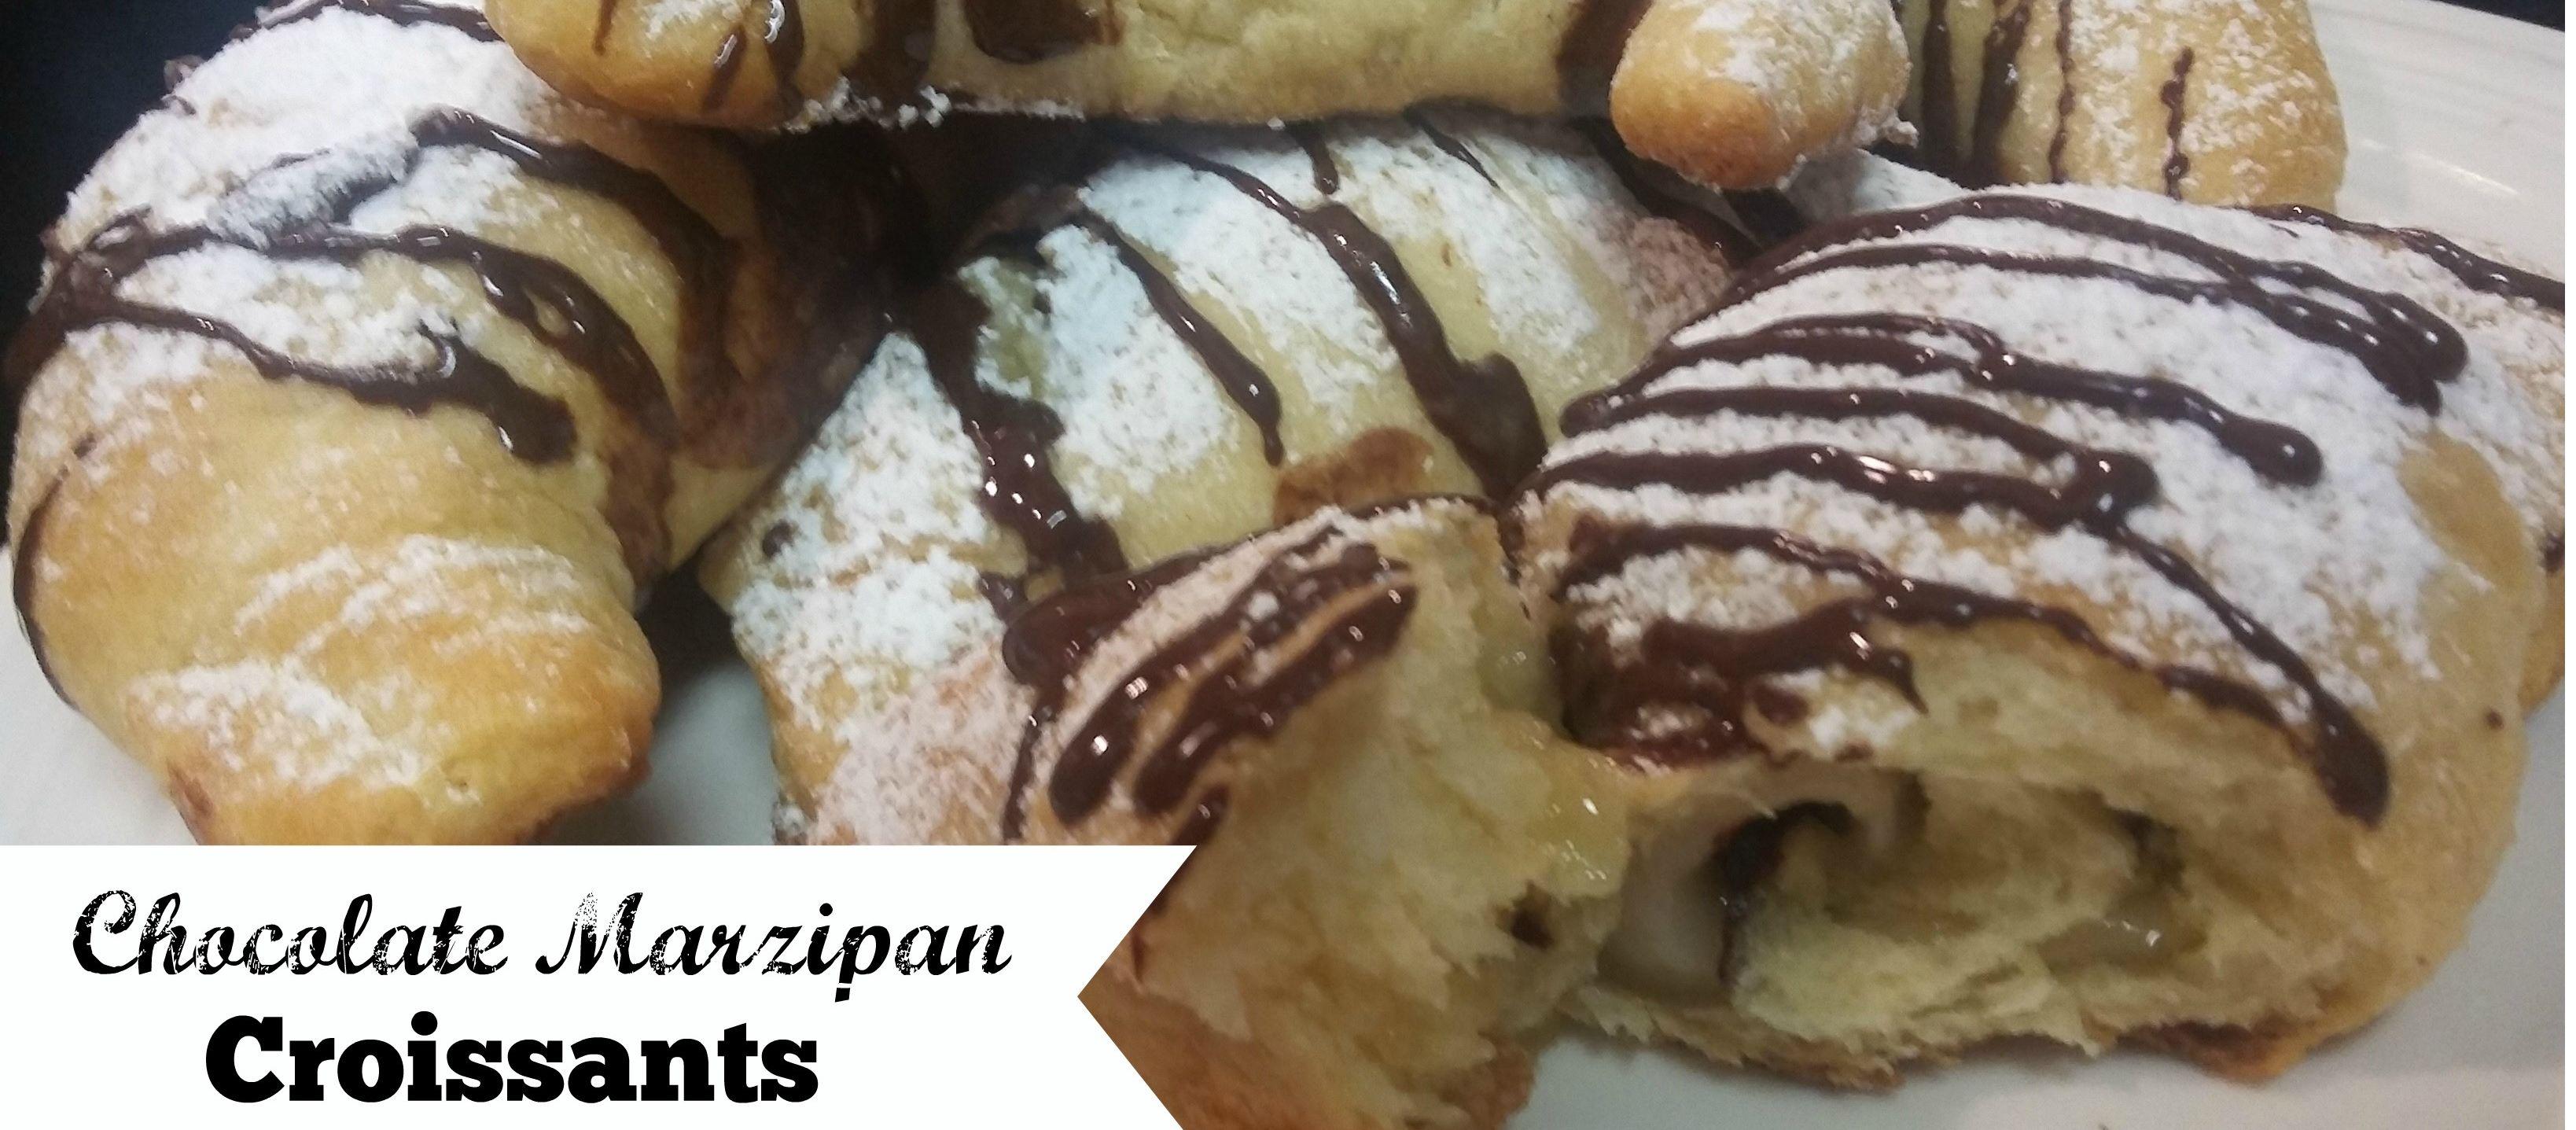 Chocolate Marzipan Croissants